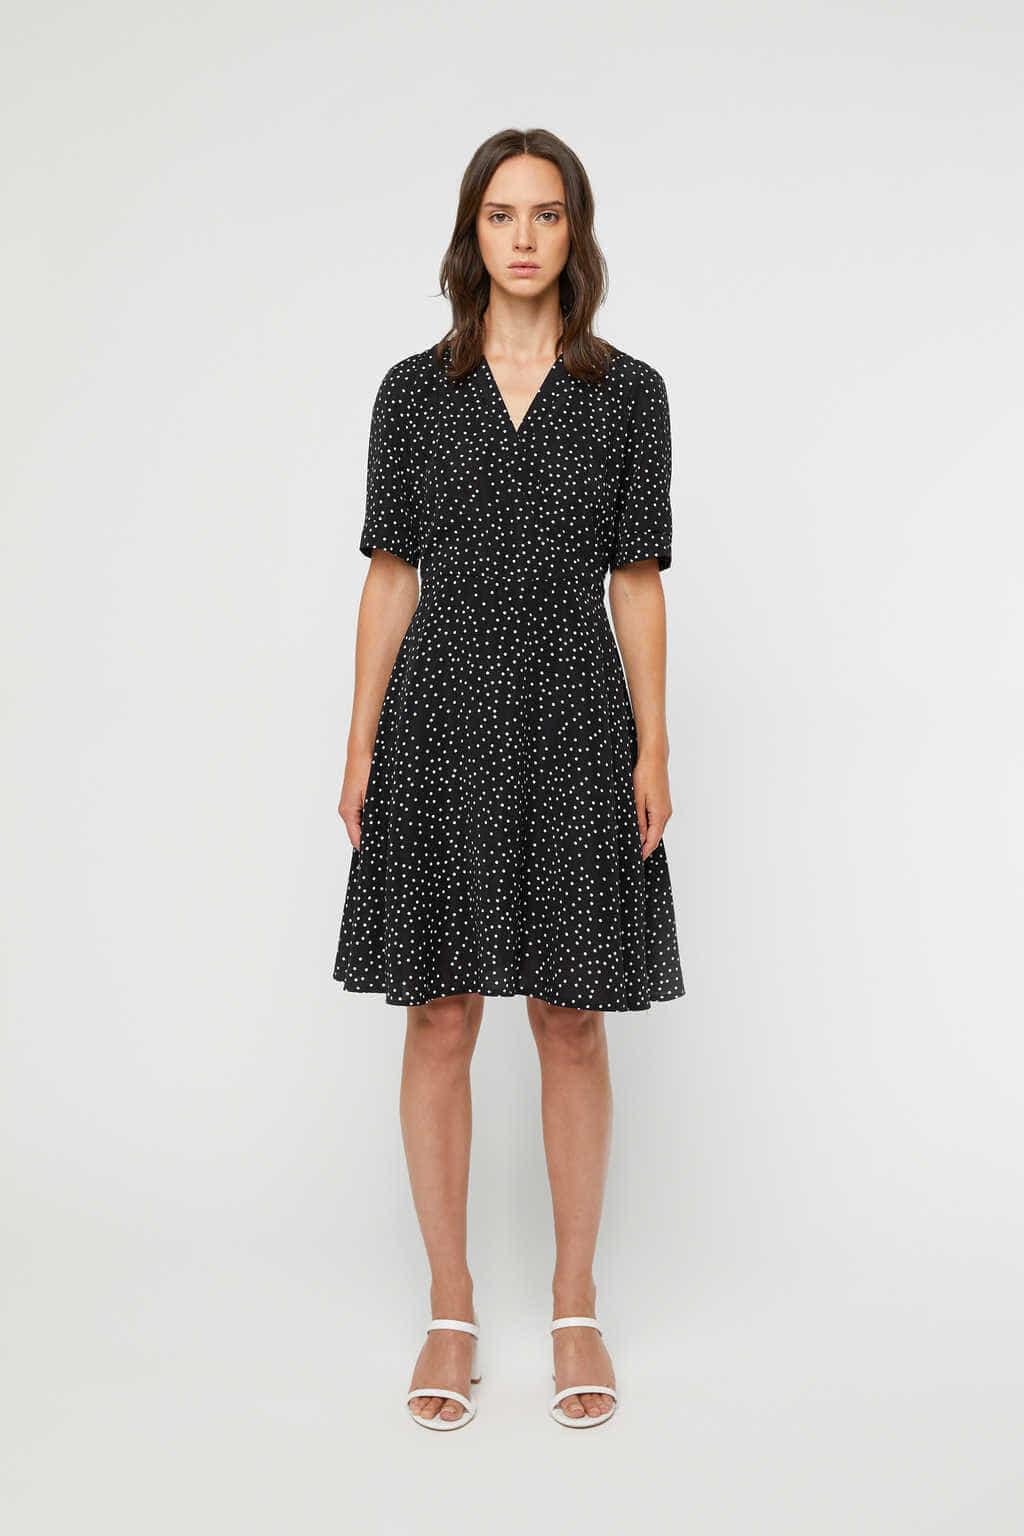 Dress K026 Black 2